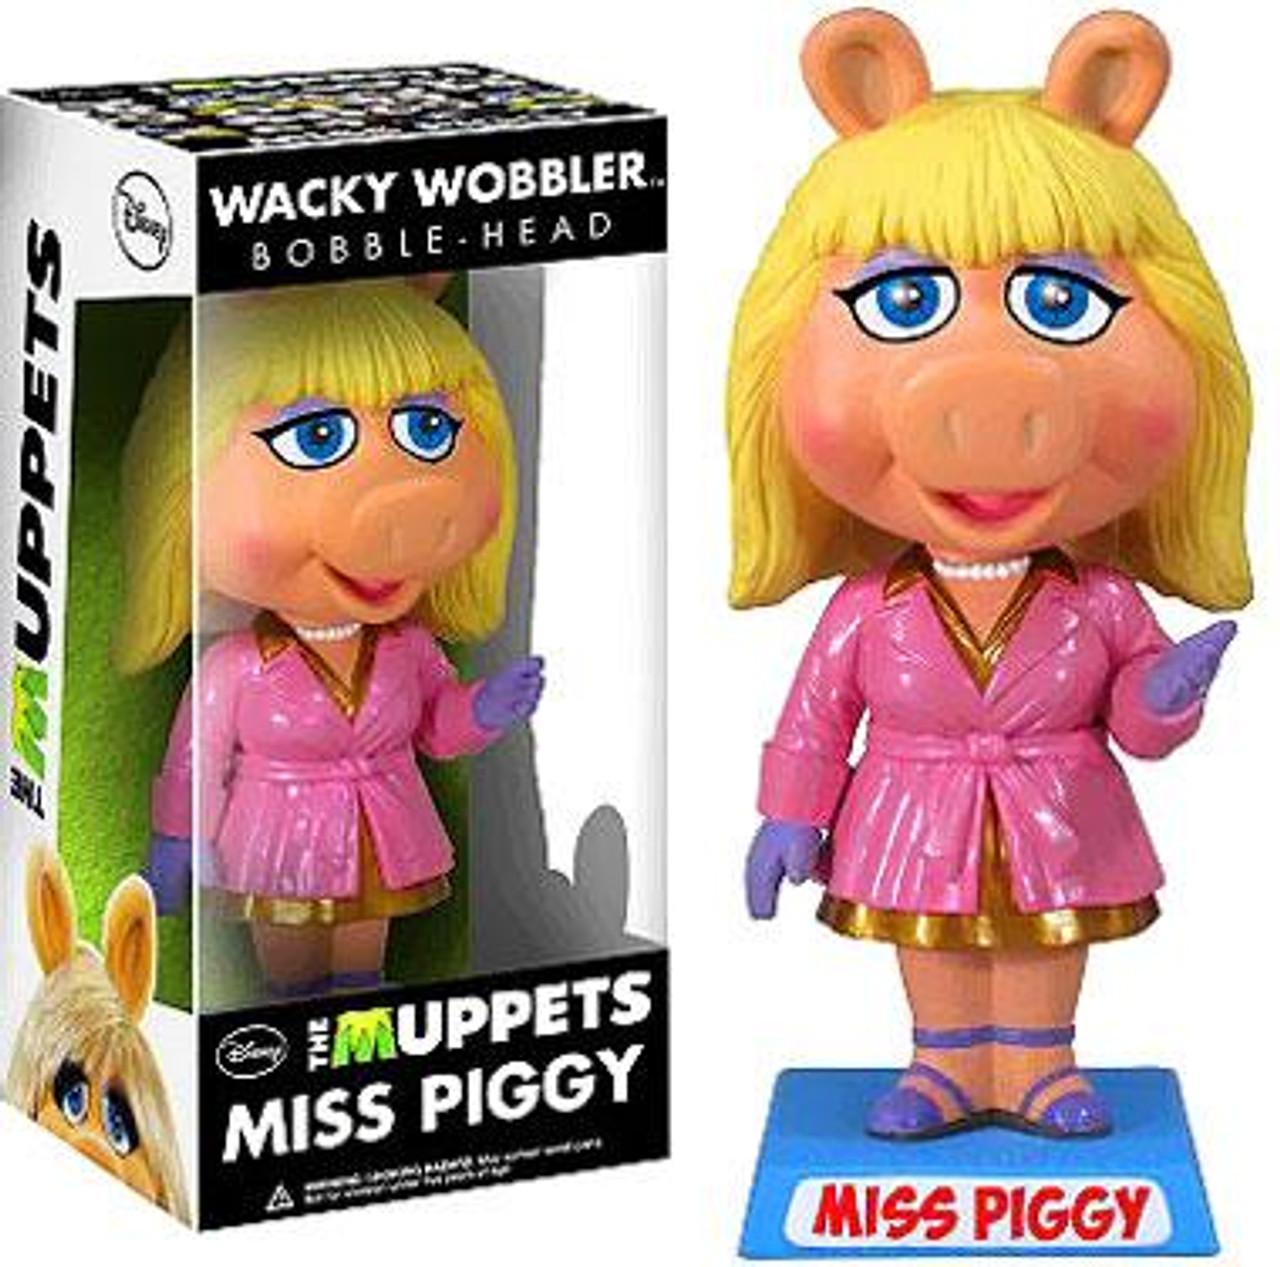 Funko The Muppets Wacky Wobbler Miss Piggy Bobble Head